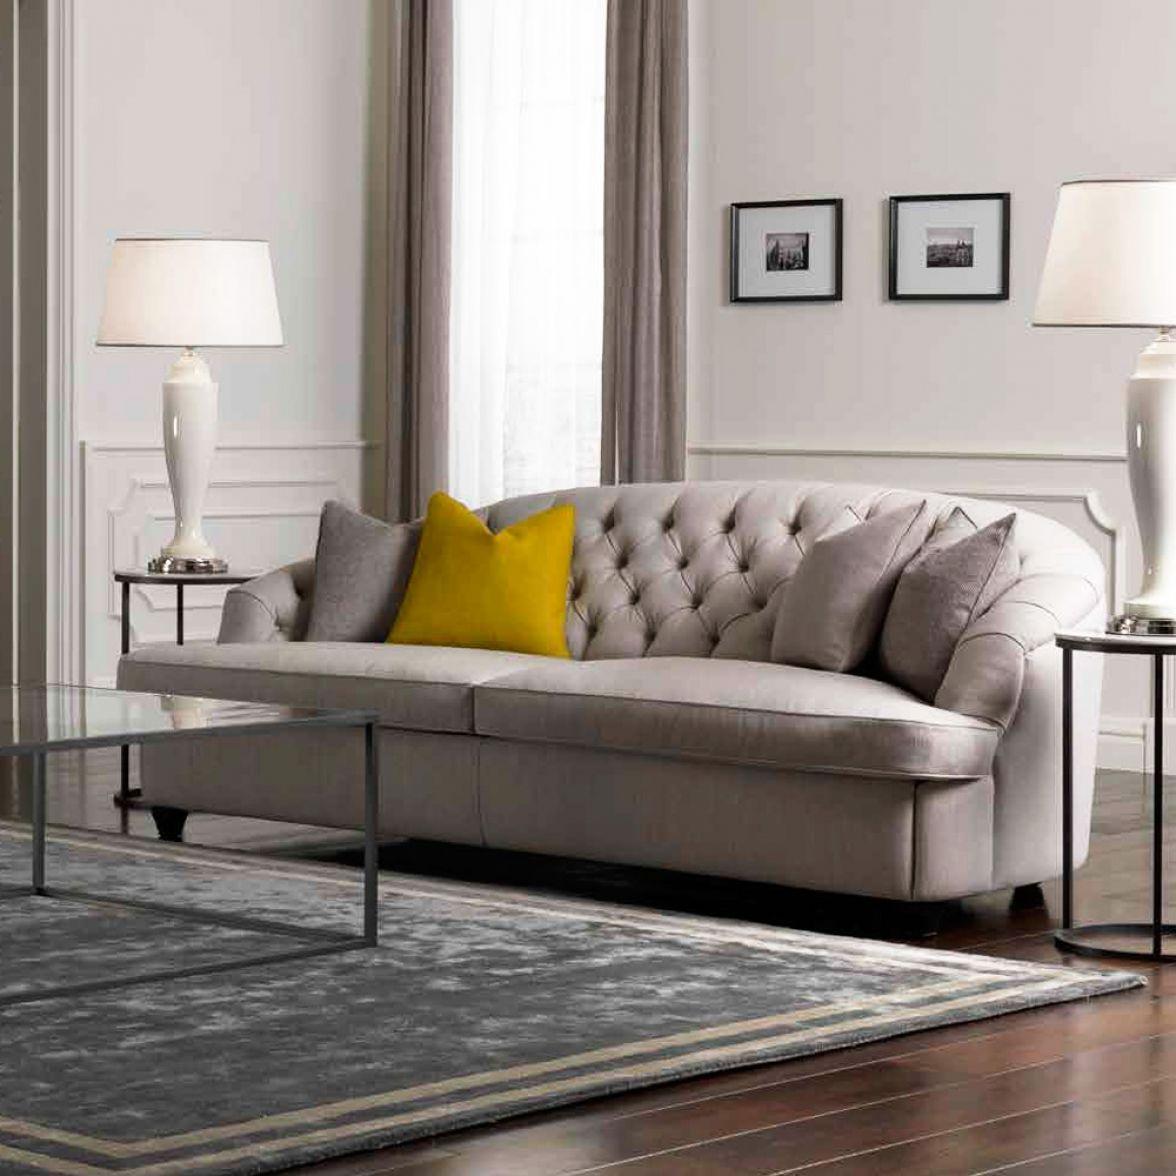 Savon sofa-bed